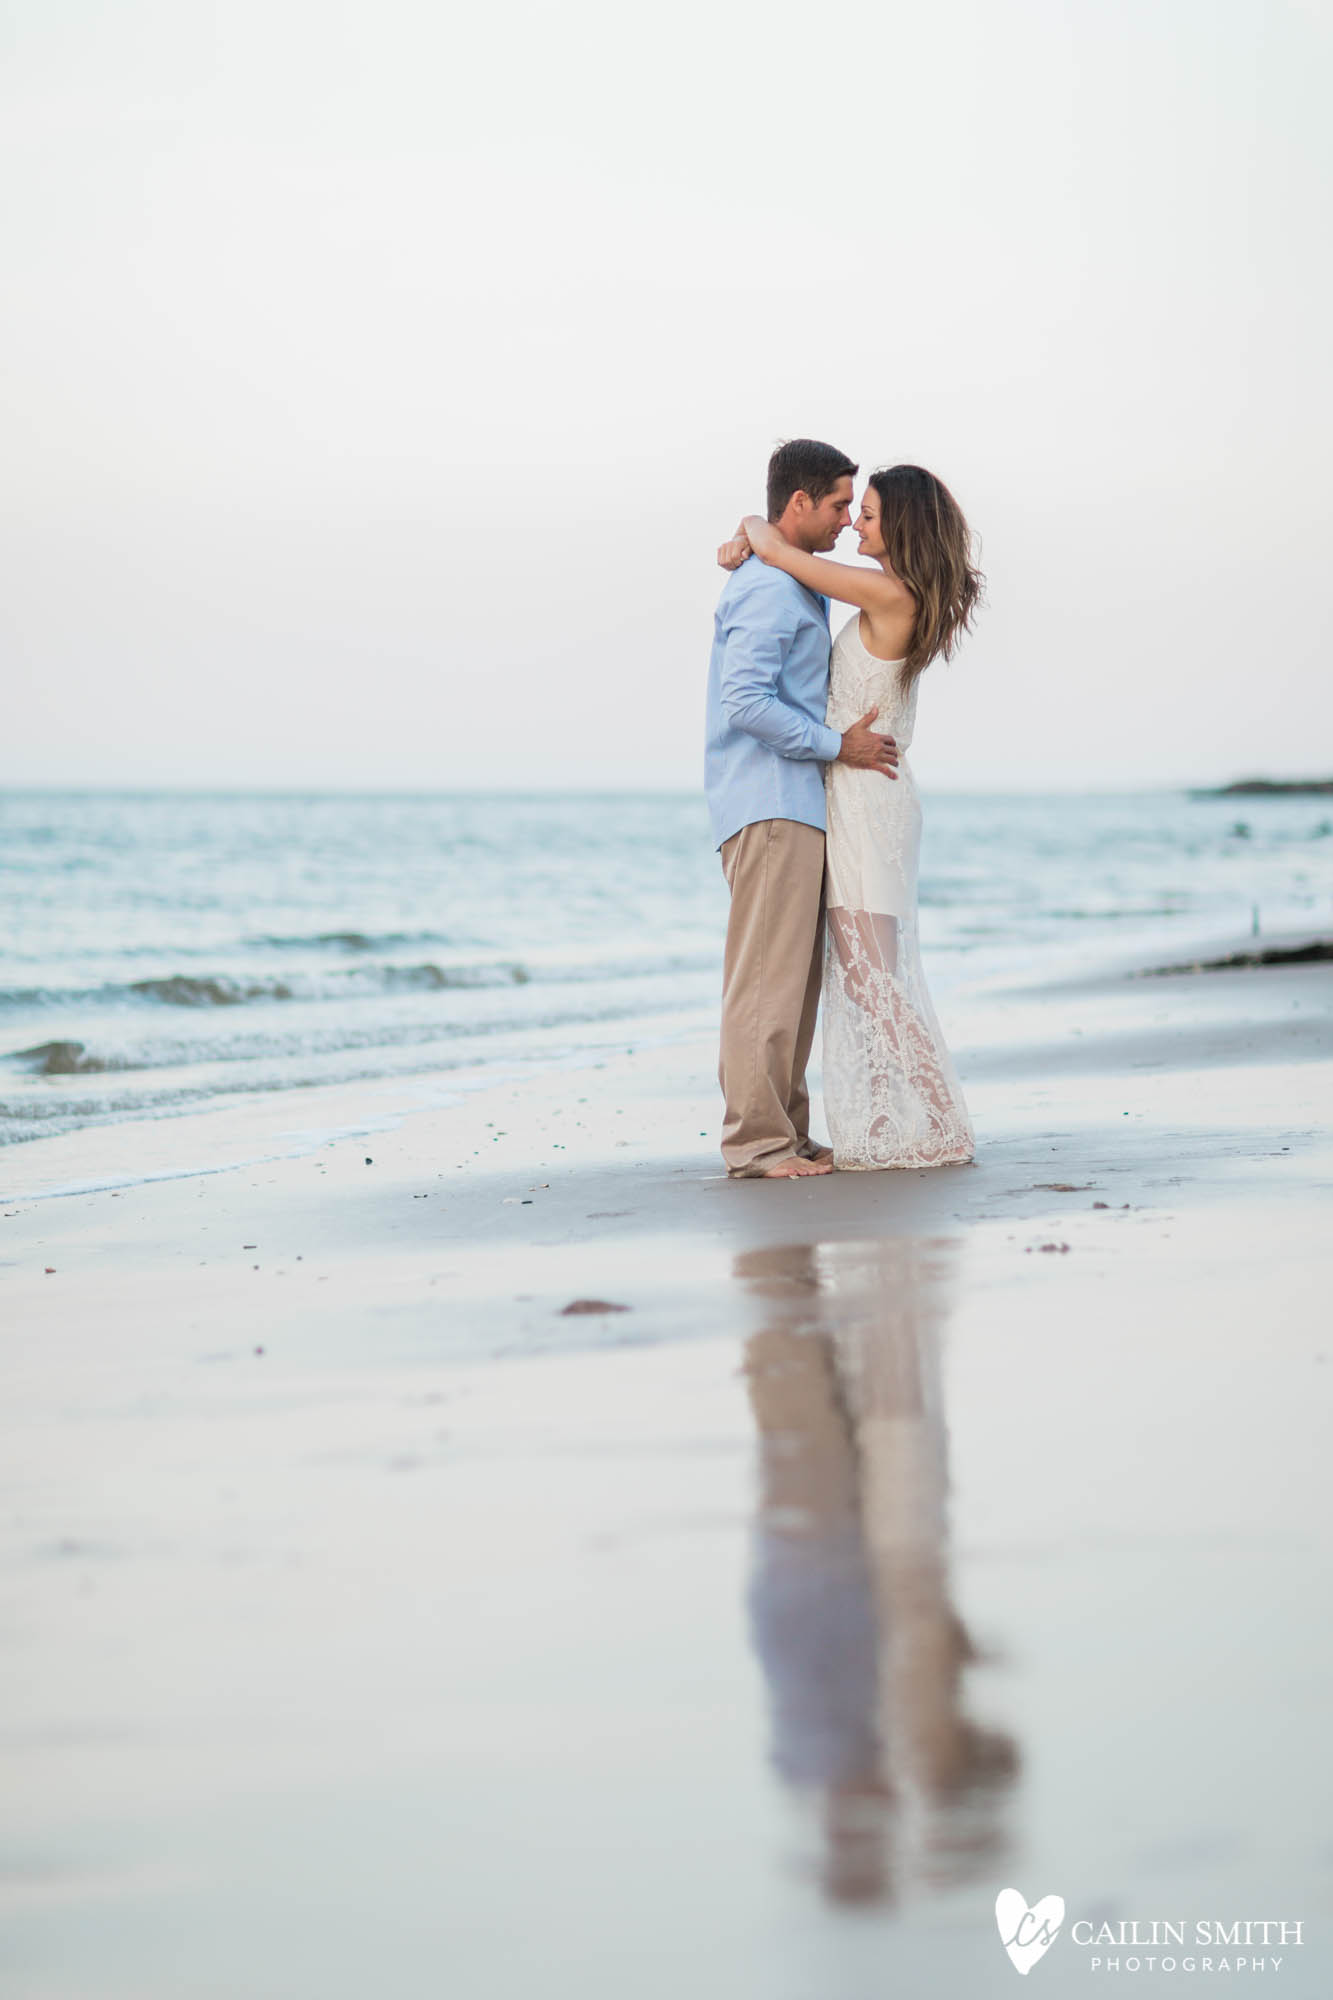 Megan_Tyson_Little_Talbot_Engagement_014.jpg